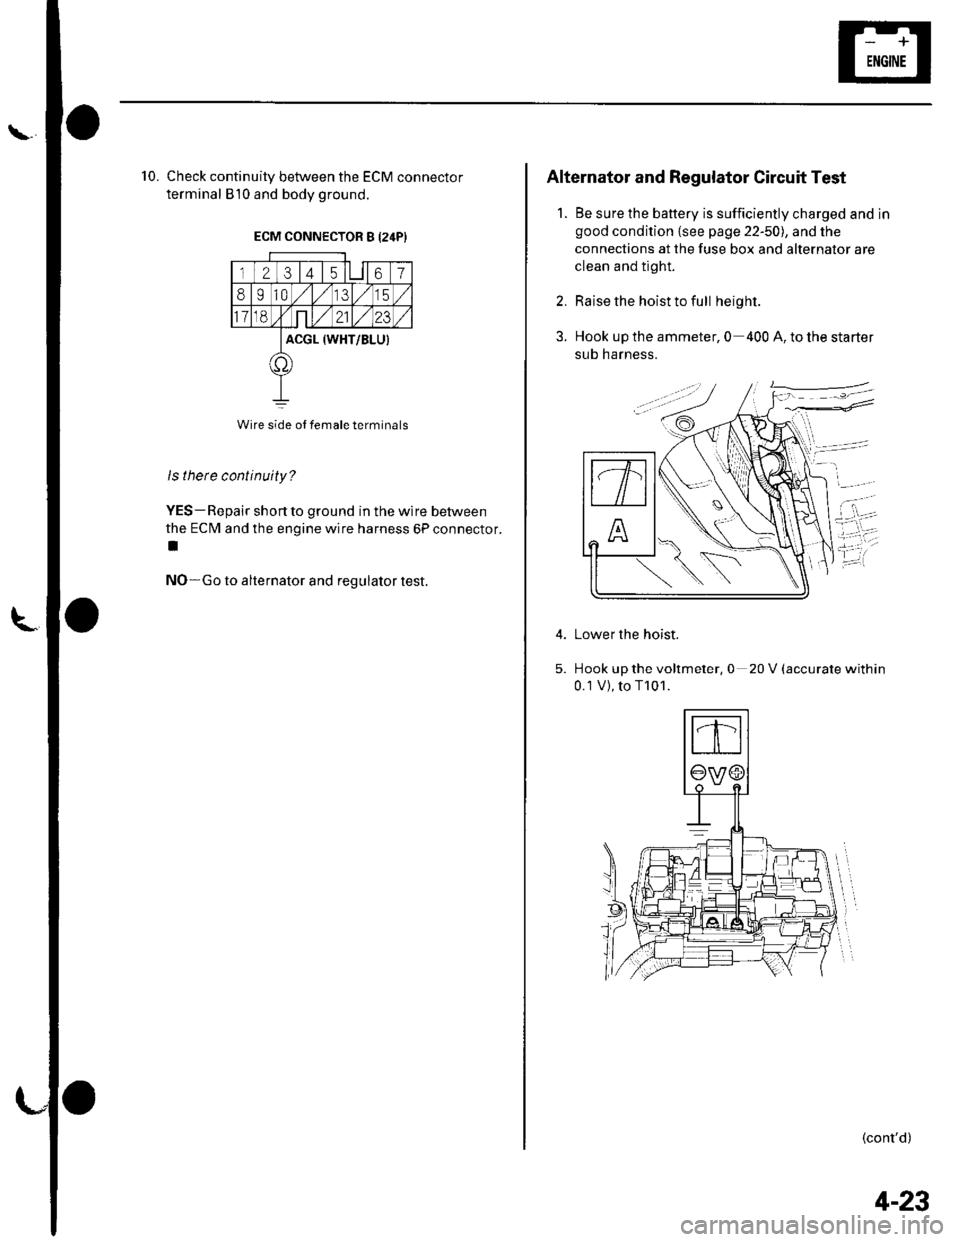 HONDA CIVIC 2003 7.G Workshop Manual, Page 58. '